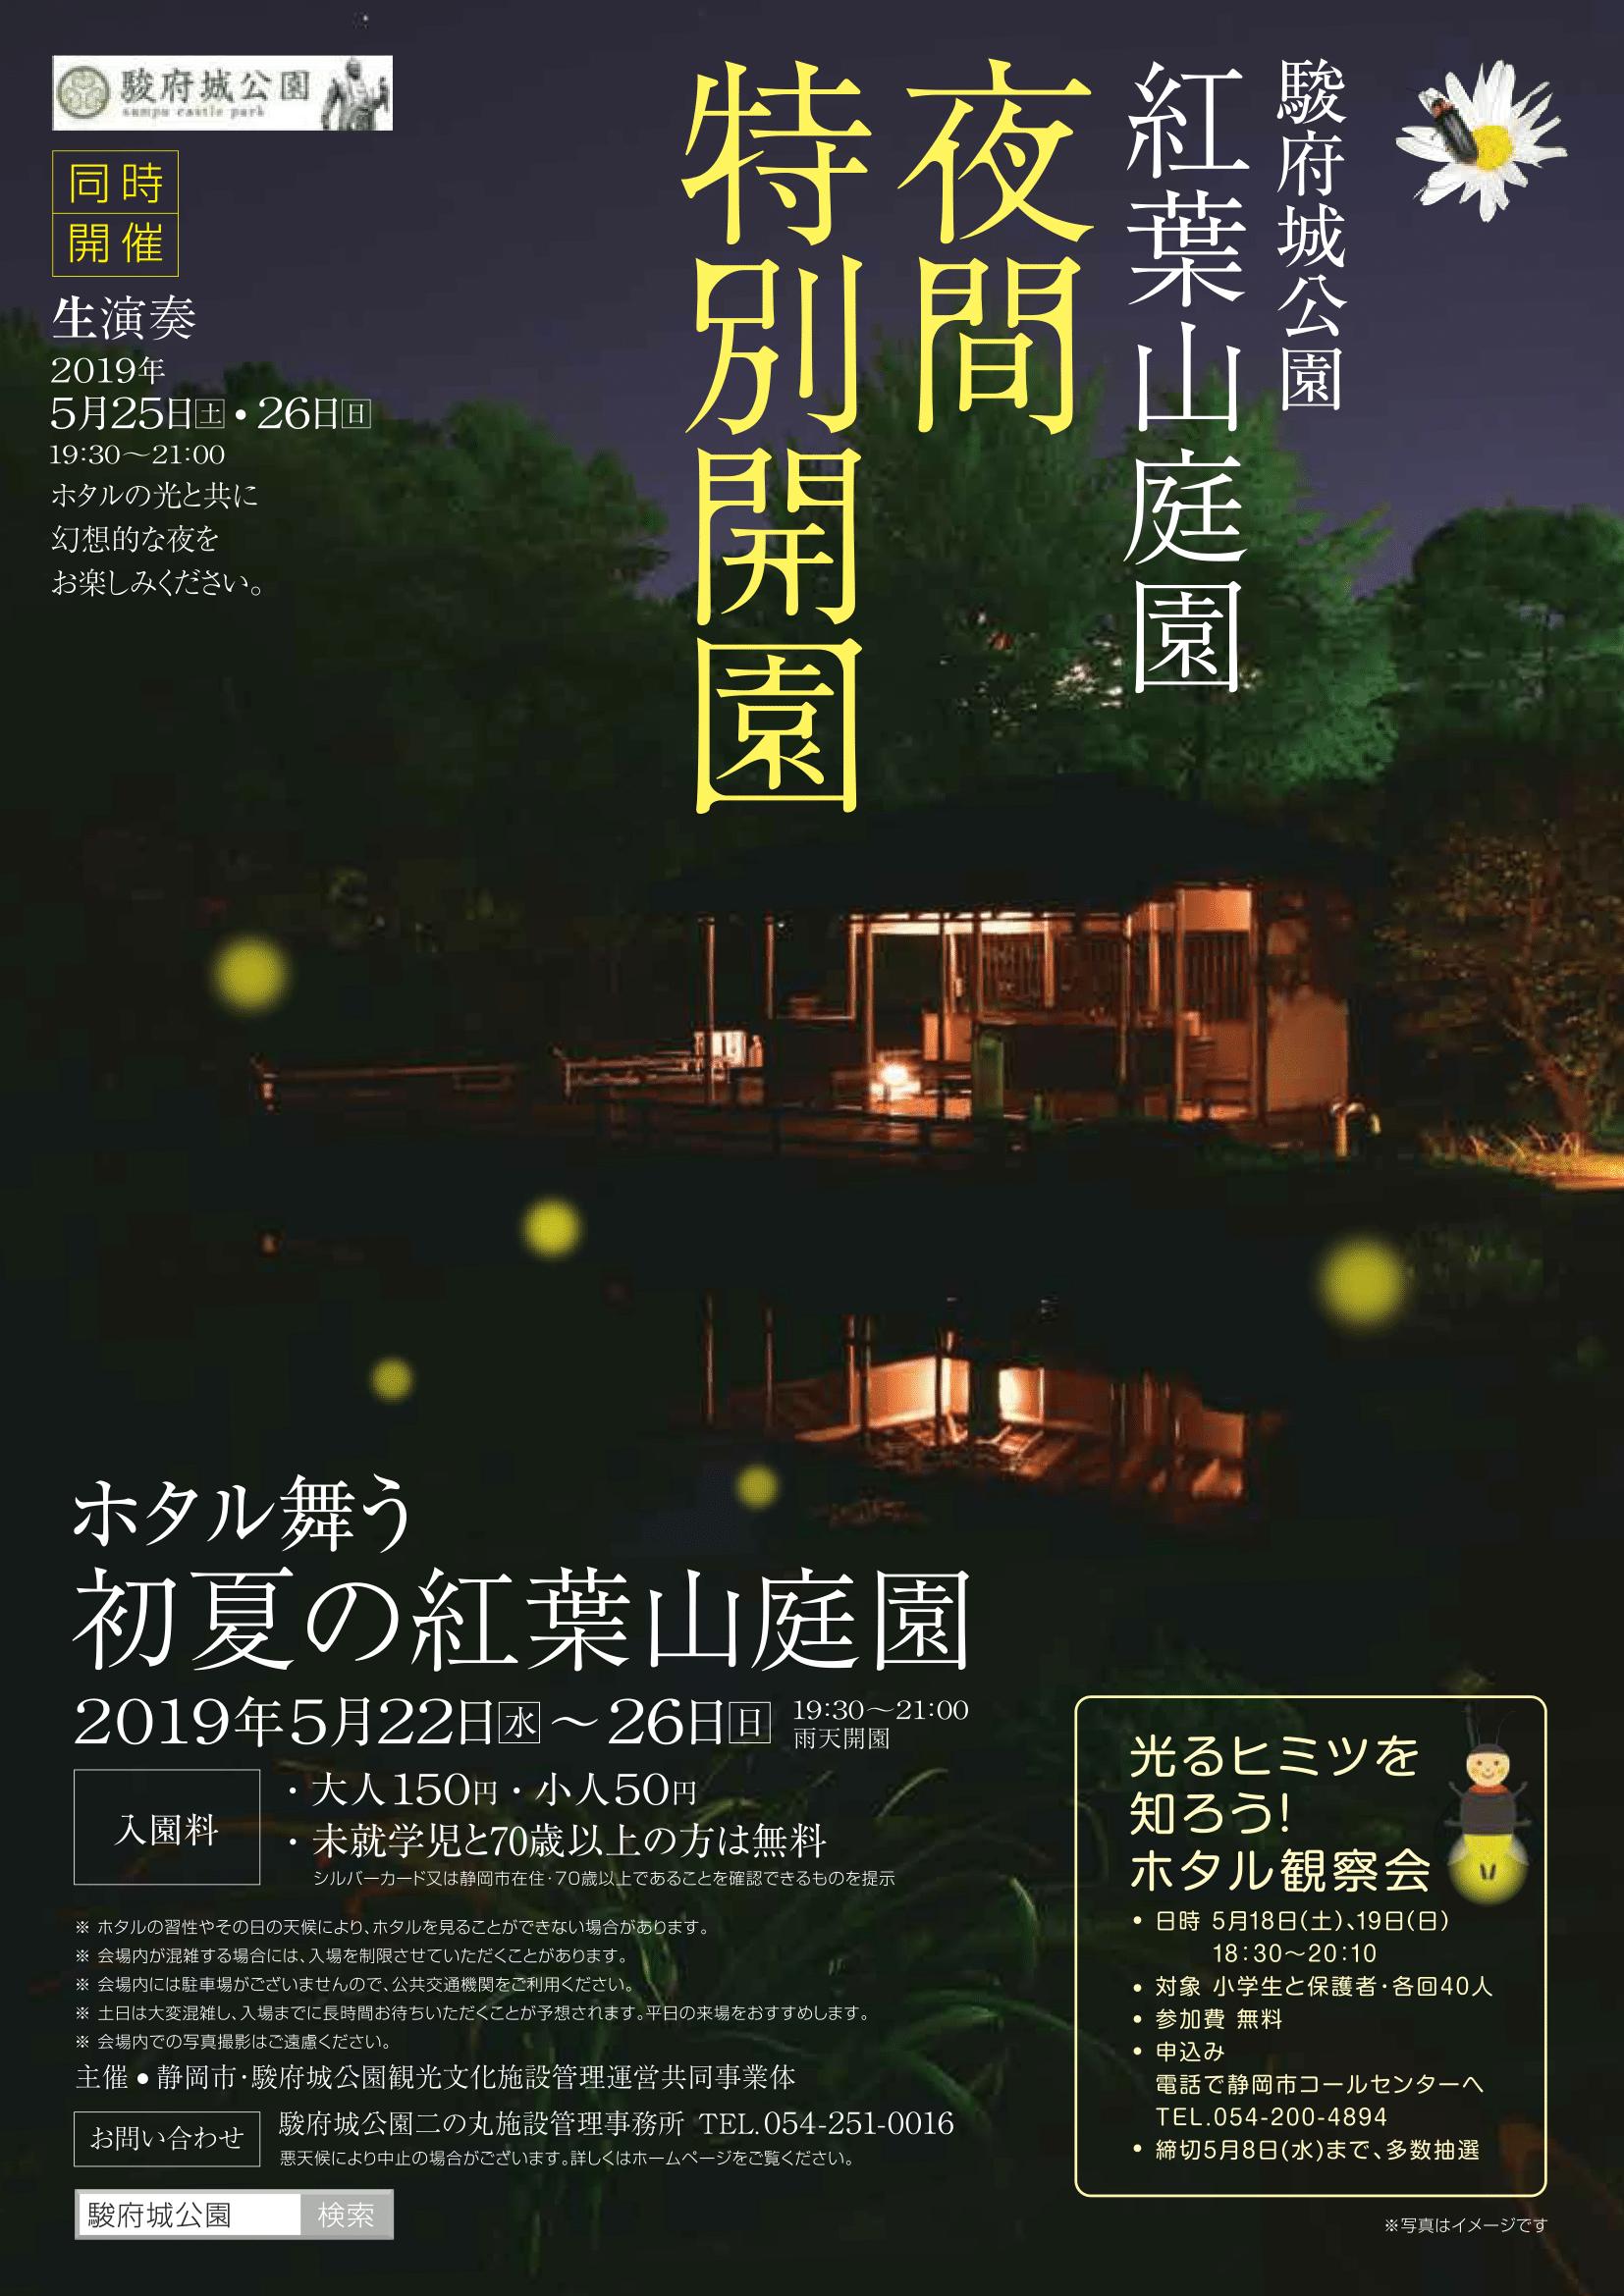 https://www.shizutan.jp/learning/2019/04/22/images/%E3%83%81%E3%83%A9%E3%82%B7%E8%A1%A8.png